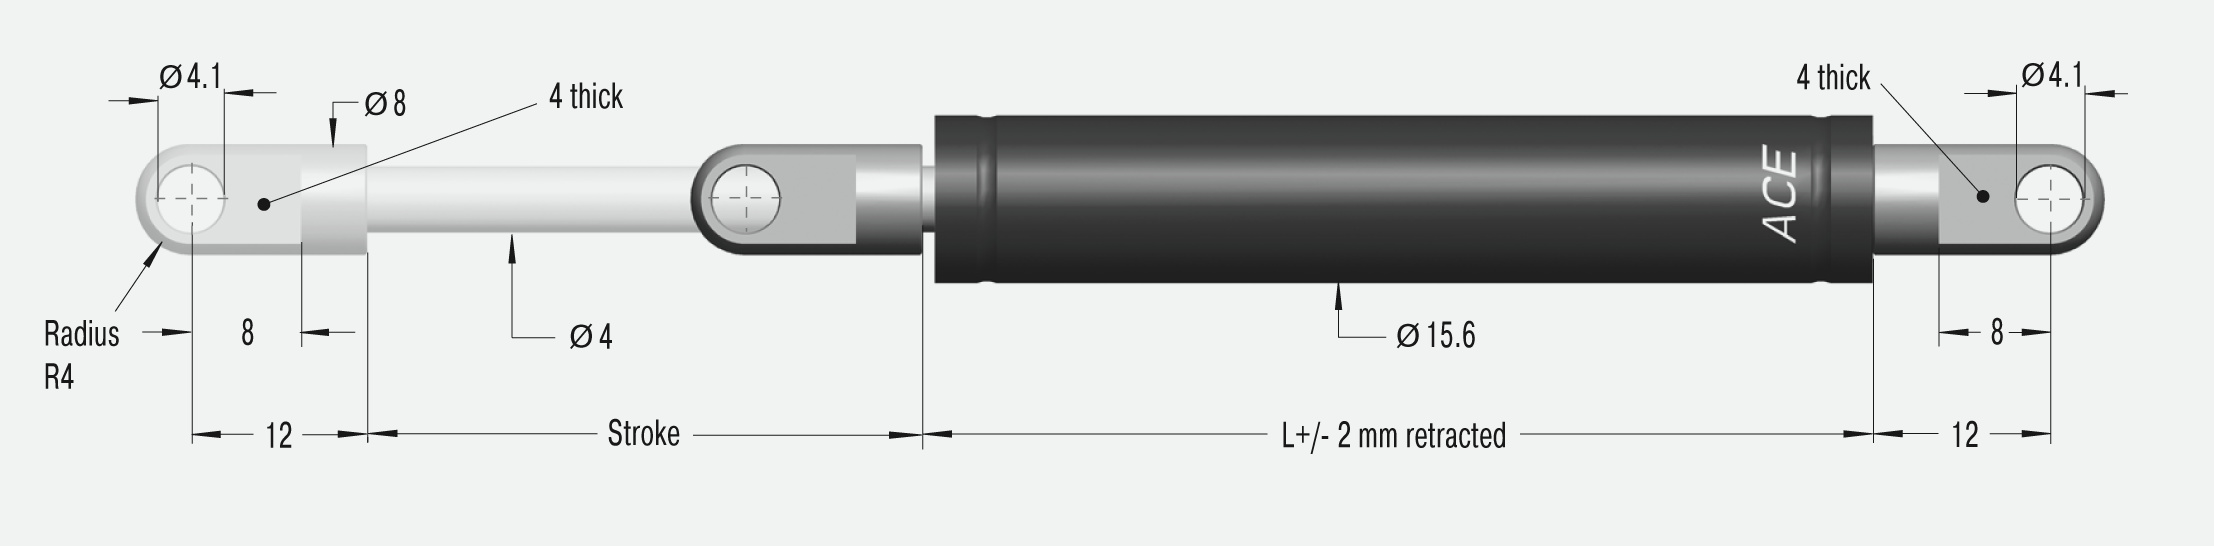 GZ-15-120